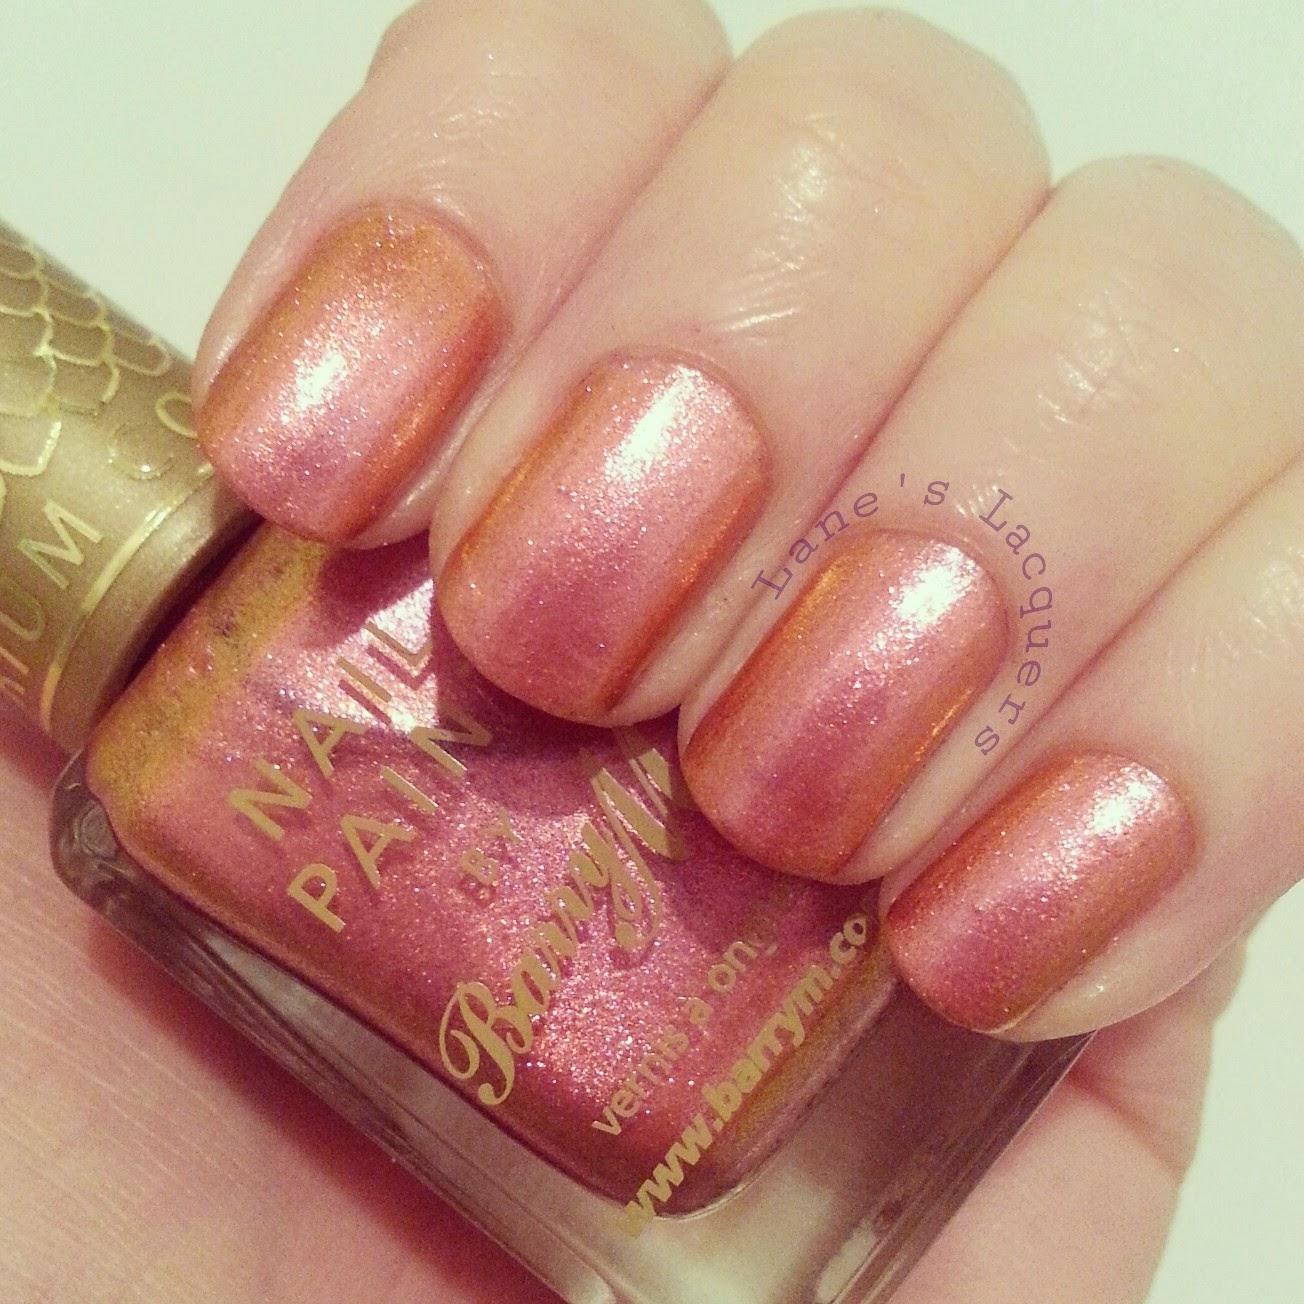 barry-m-aquarium-pink-aqnp4-swatch-nails